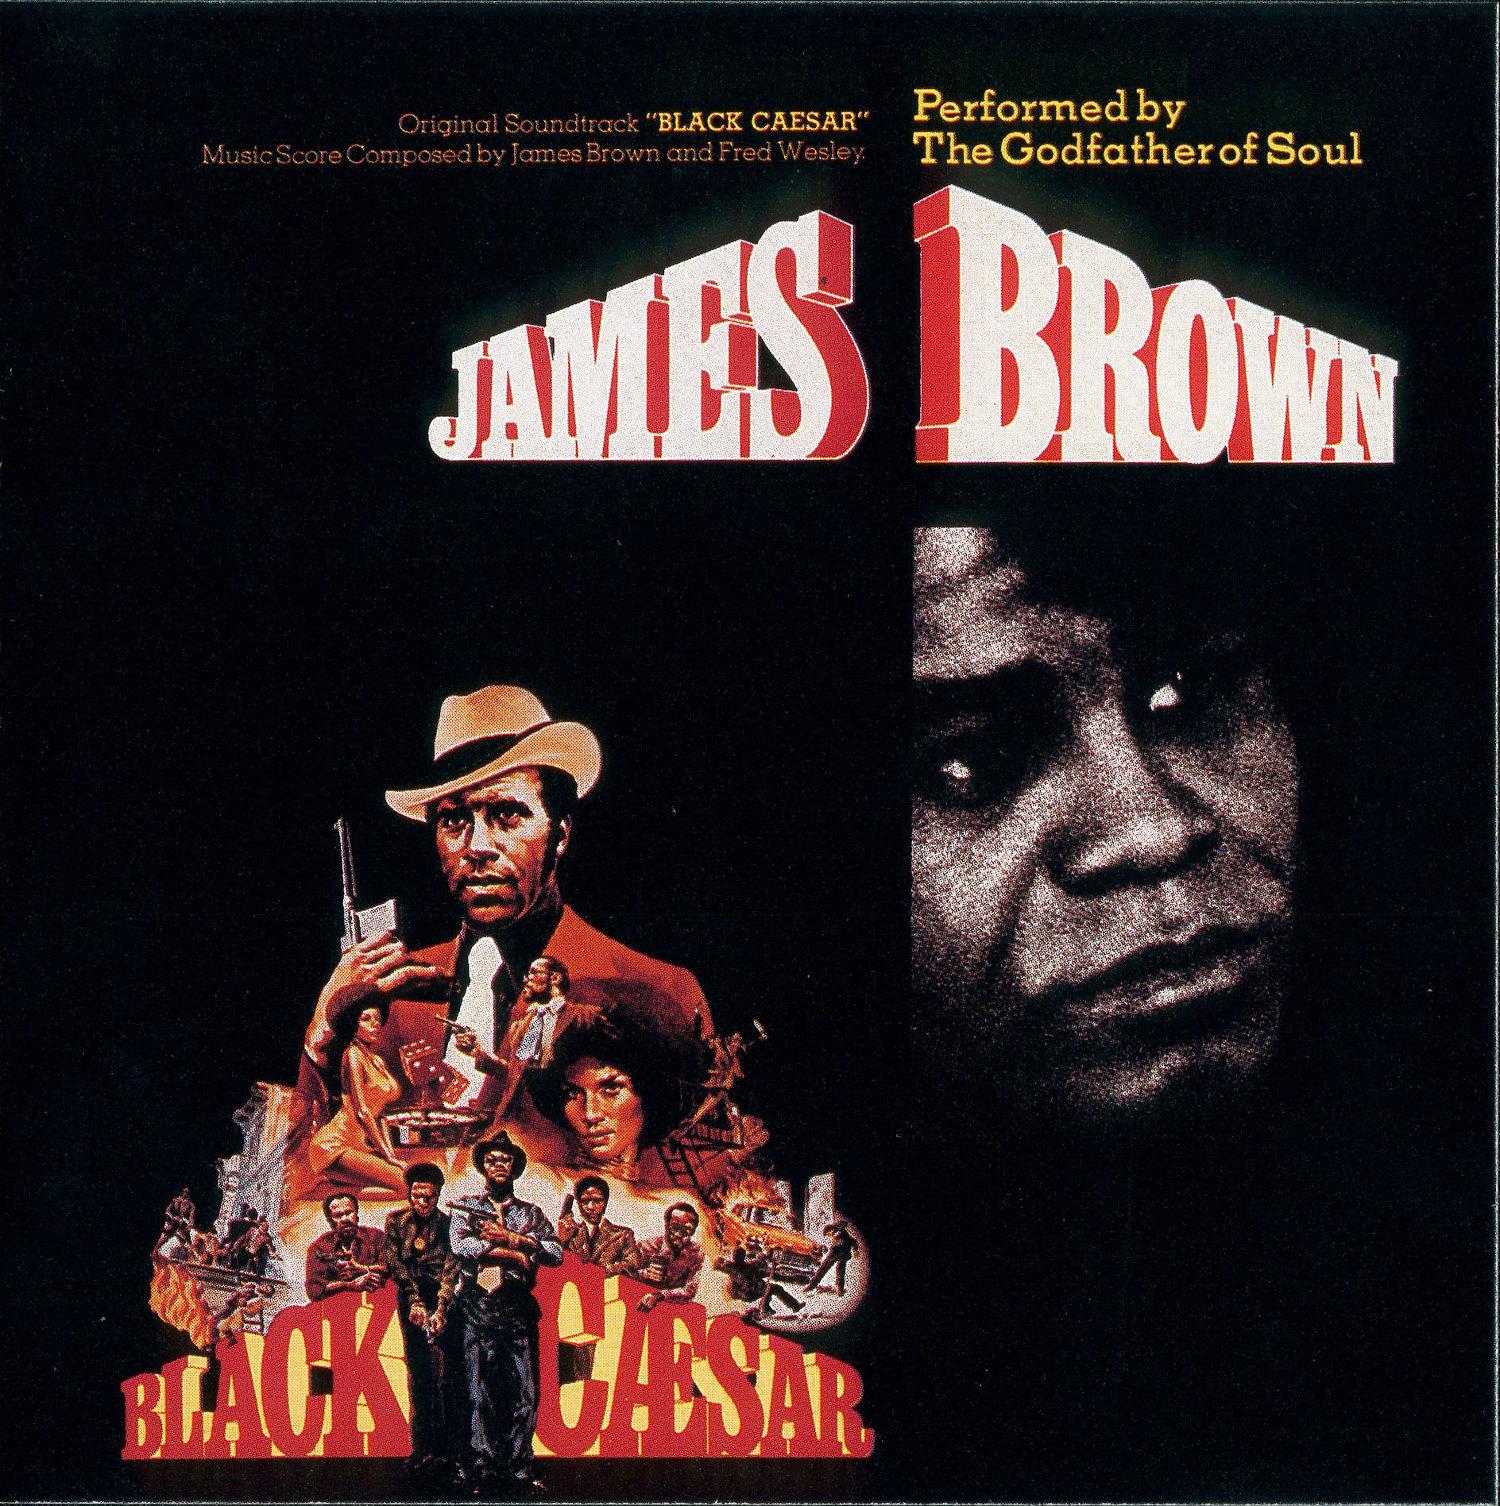 1973 Polydor Lp Black Caesar Soundtrack The James